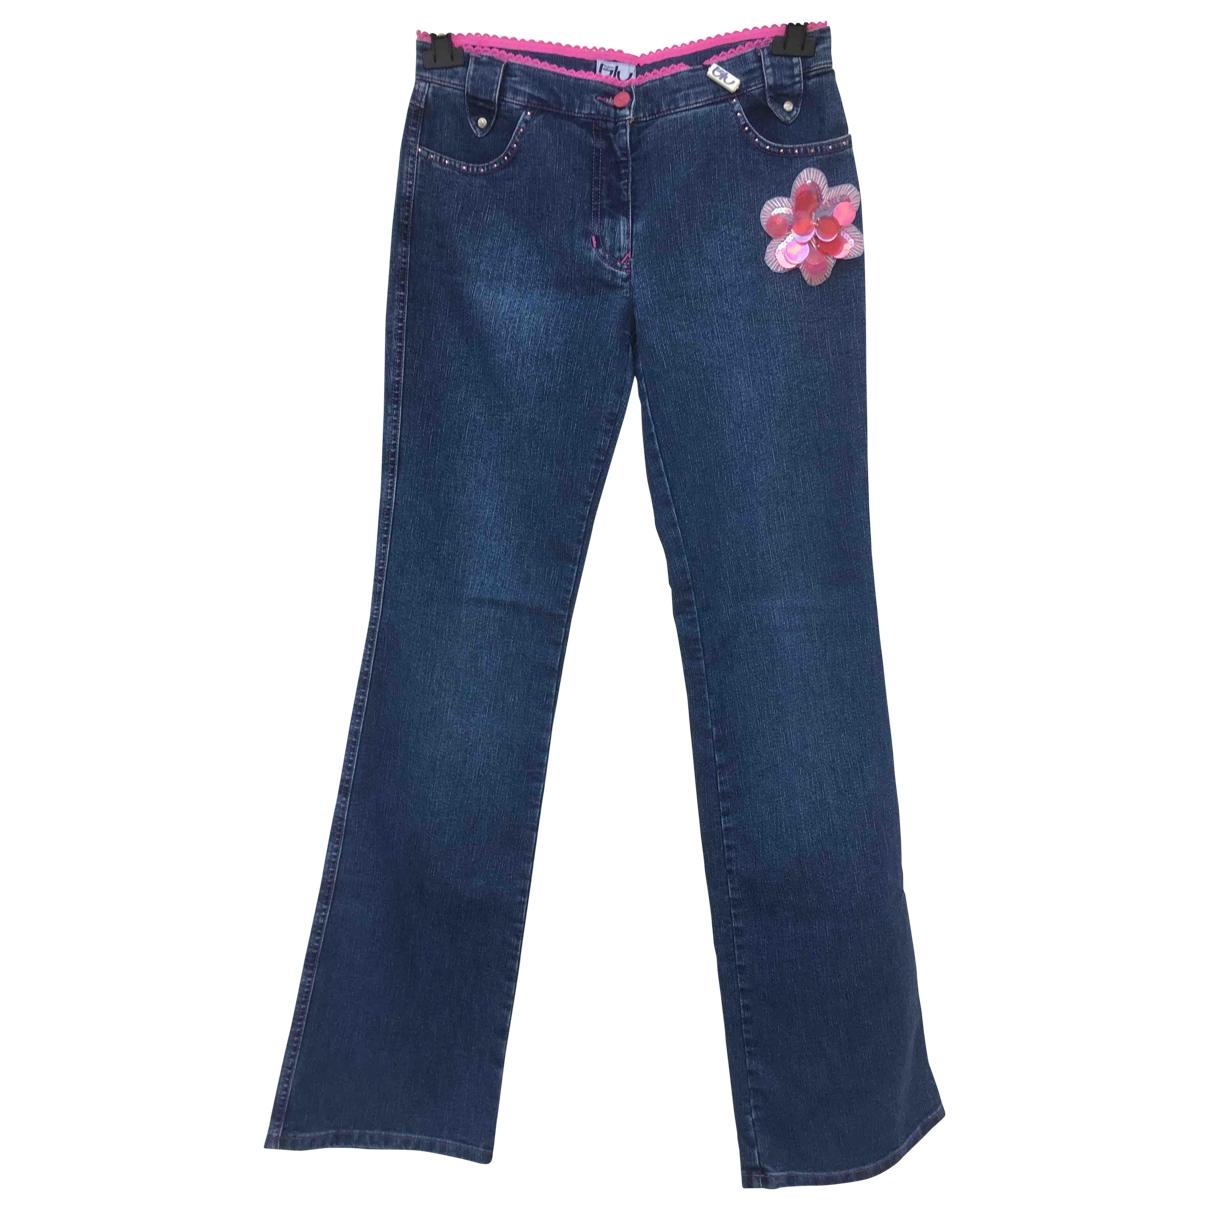 Byblos \N Blue Denim - Jeans Jeans for Women 28 US